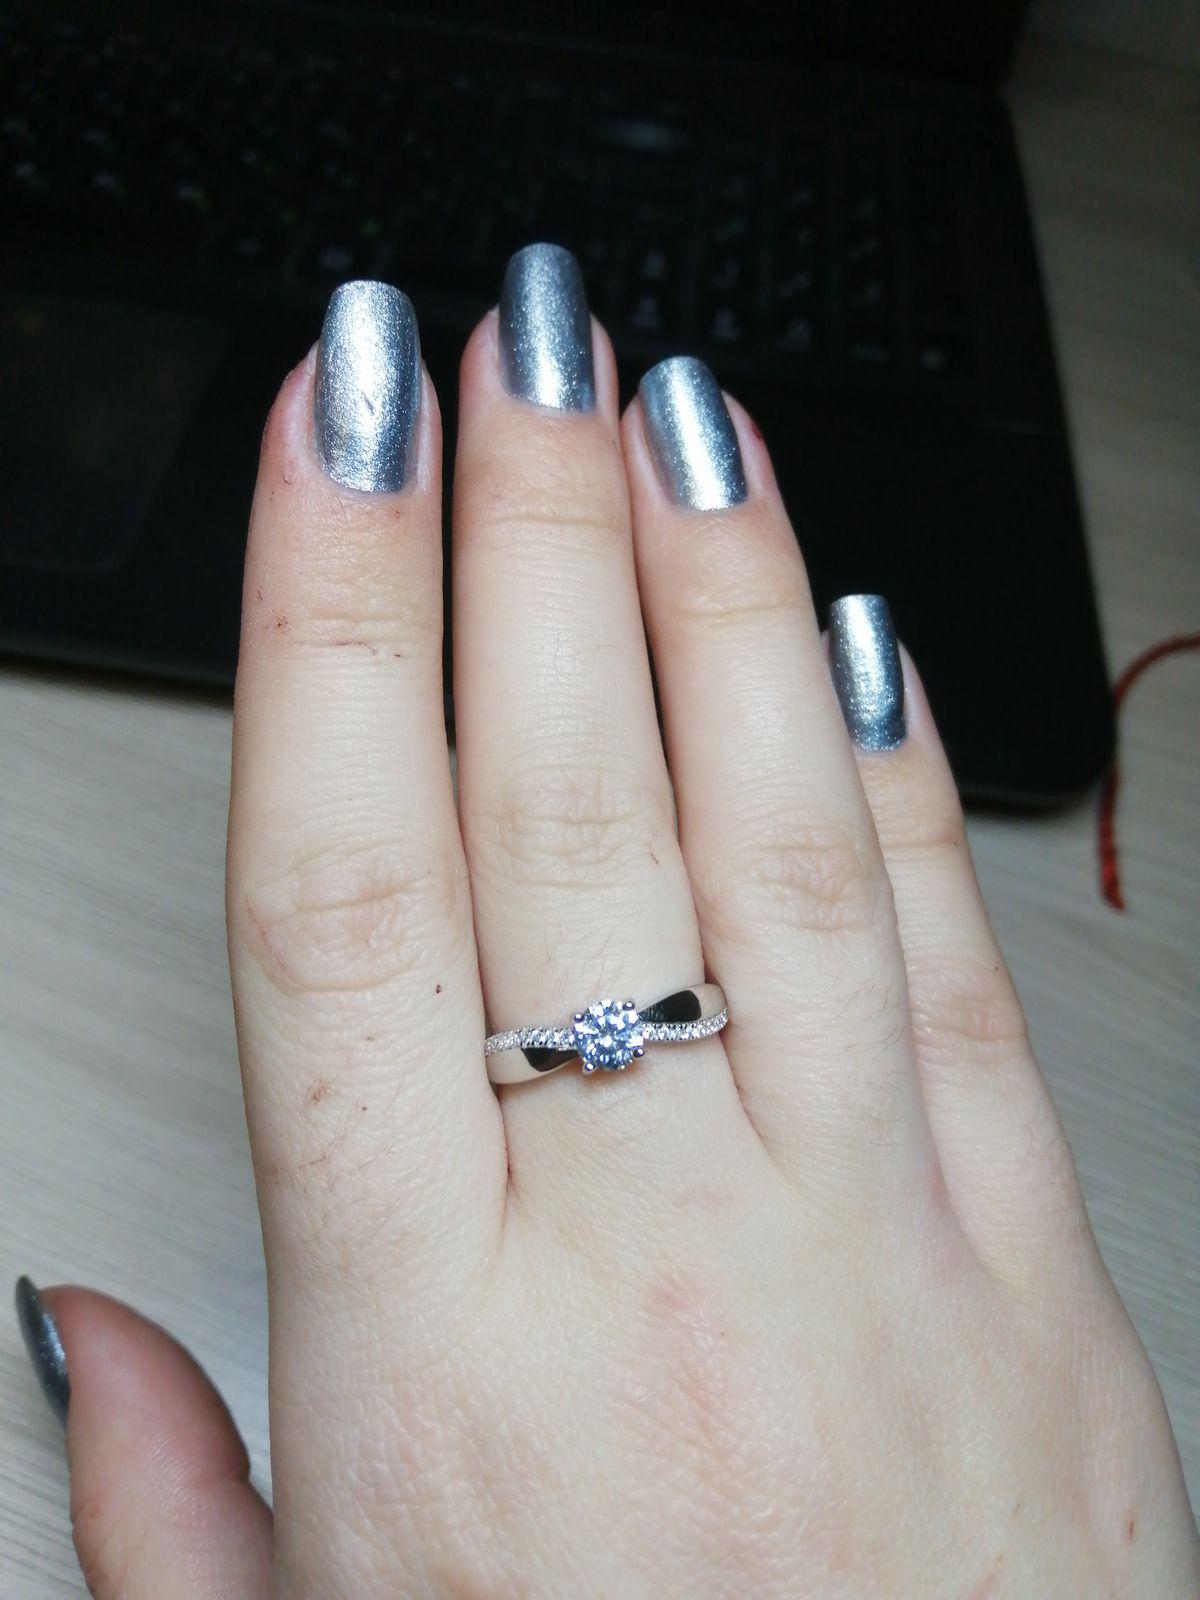 Шикарное кольцо, классика